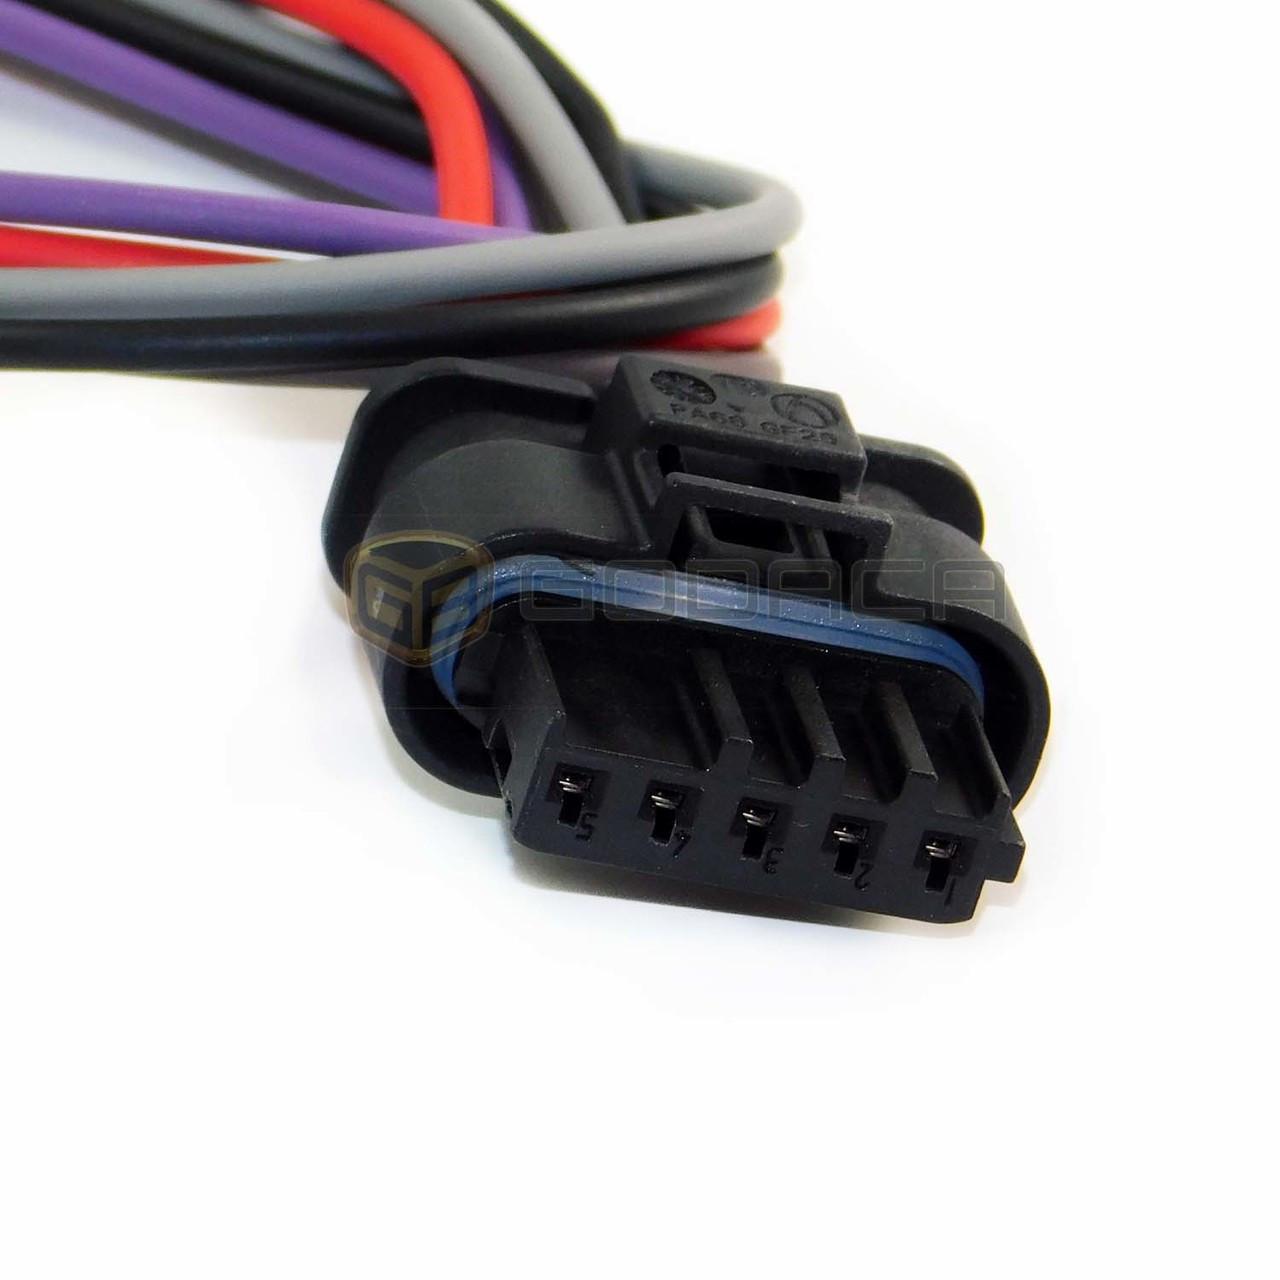 medium resolution of 1x connector wiring harness 5 pin 5 way for bmw godaca llc bmw wiring harness connector bmw wiring harness connector